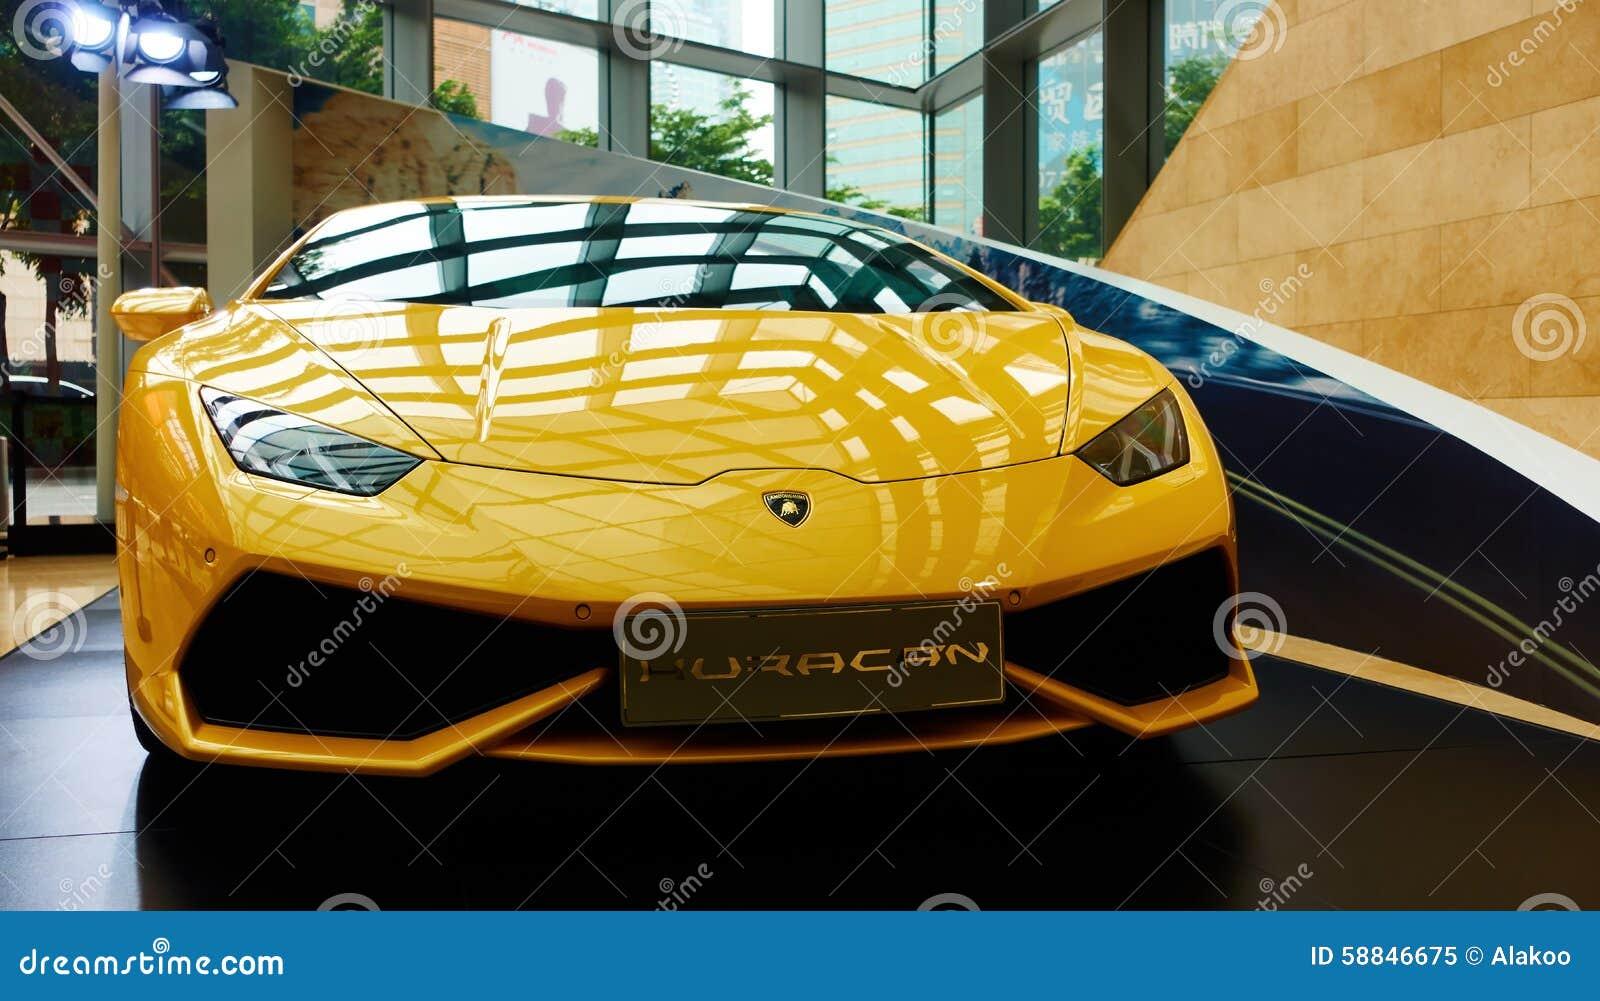 Bmw M3 Grau Vorderansicht Treppen Menschen likewise JD 96496 furthermore How To Draw A Lamborghini Gallardo Side View likewise Lamborghini Huracan Coloring Pages Side View Coloring4free furthermore Watch. on lamborghini gallardo cartoon